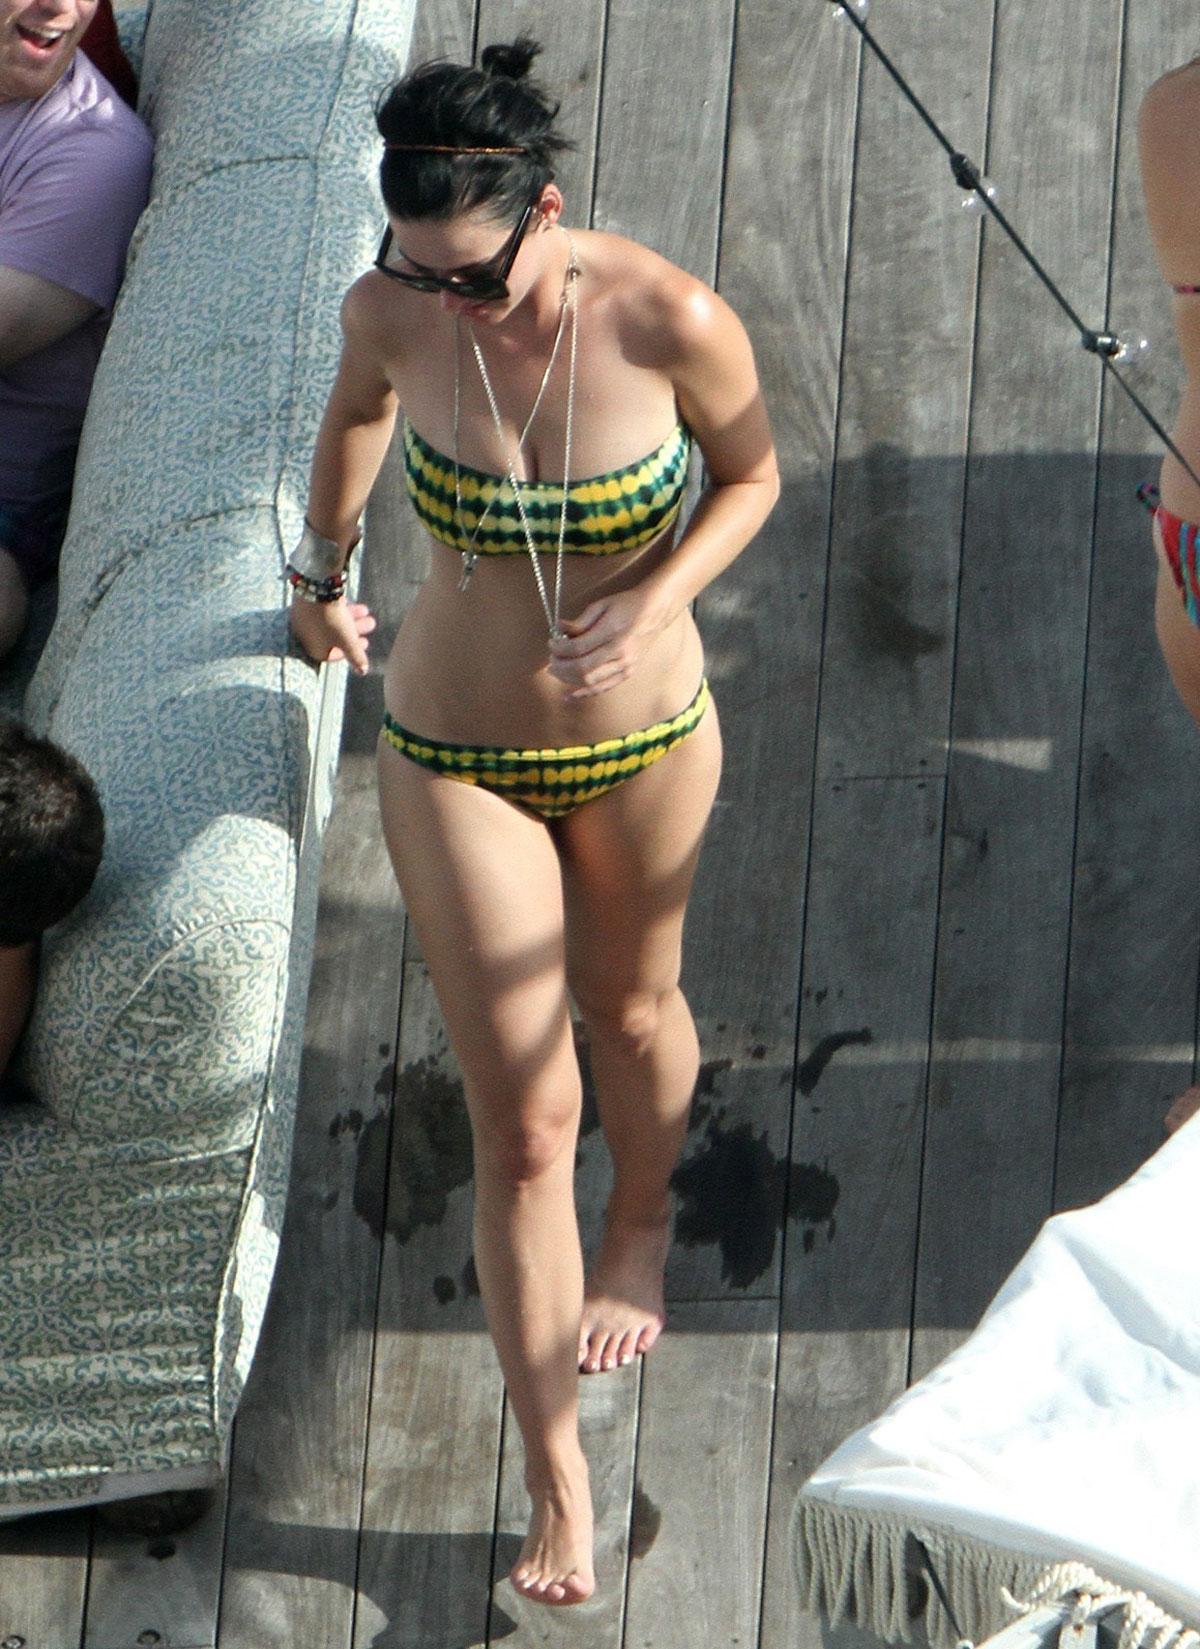 KATY PERRY Bikini Cand... Hayden Panettiere Nashville Home Address